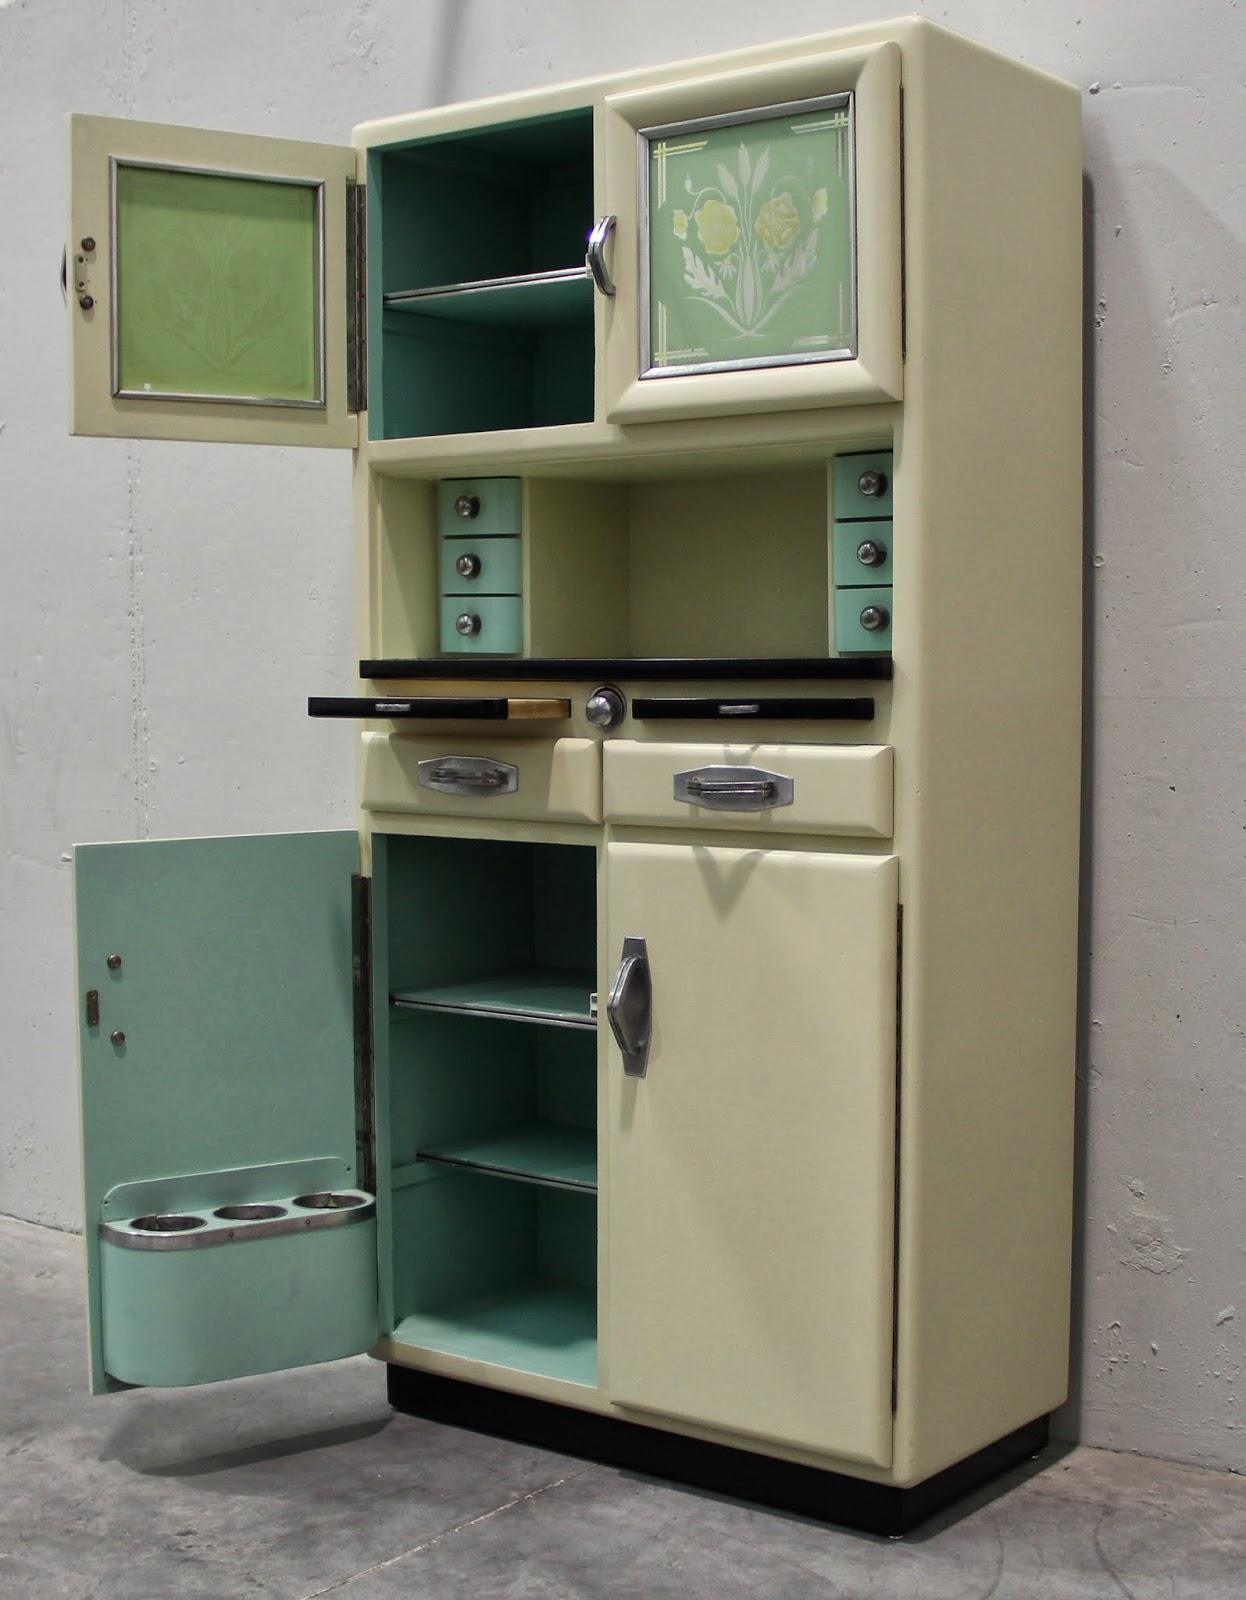 Odalisca madrid art nouveau art deco dise o del siglo for Muebles de cocina 2 mano